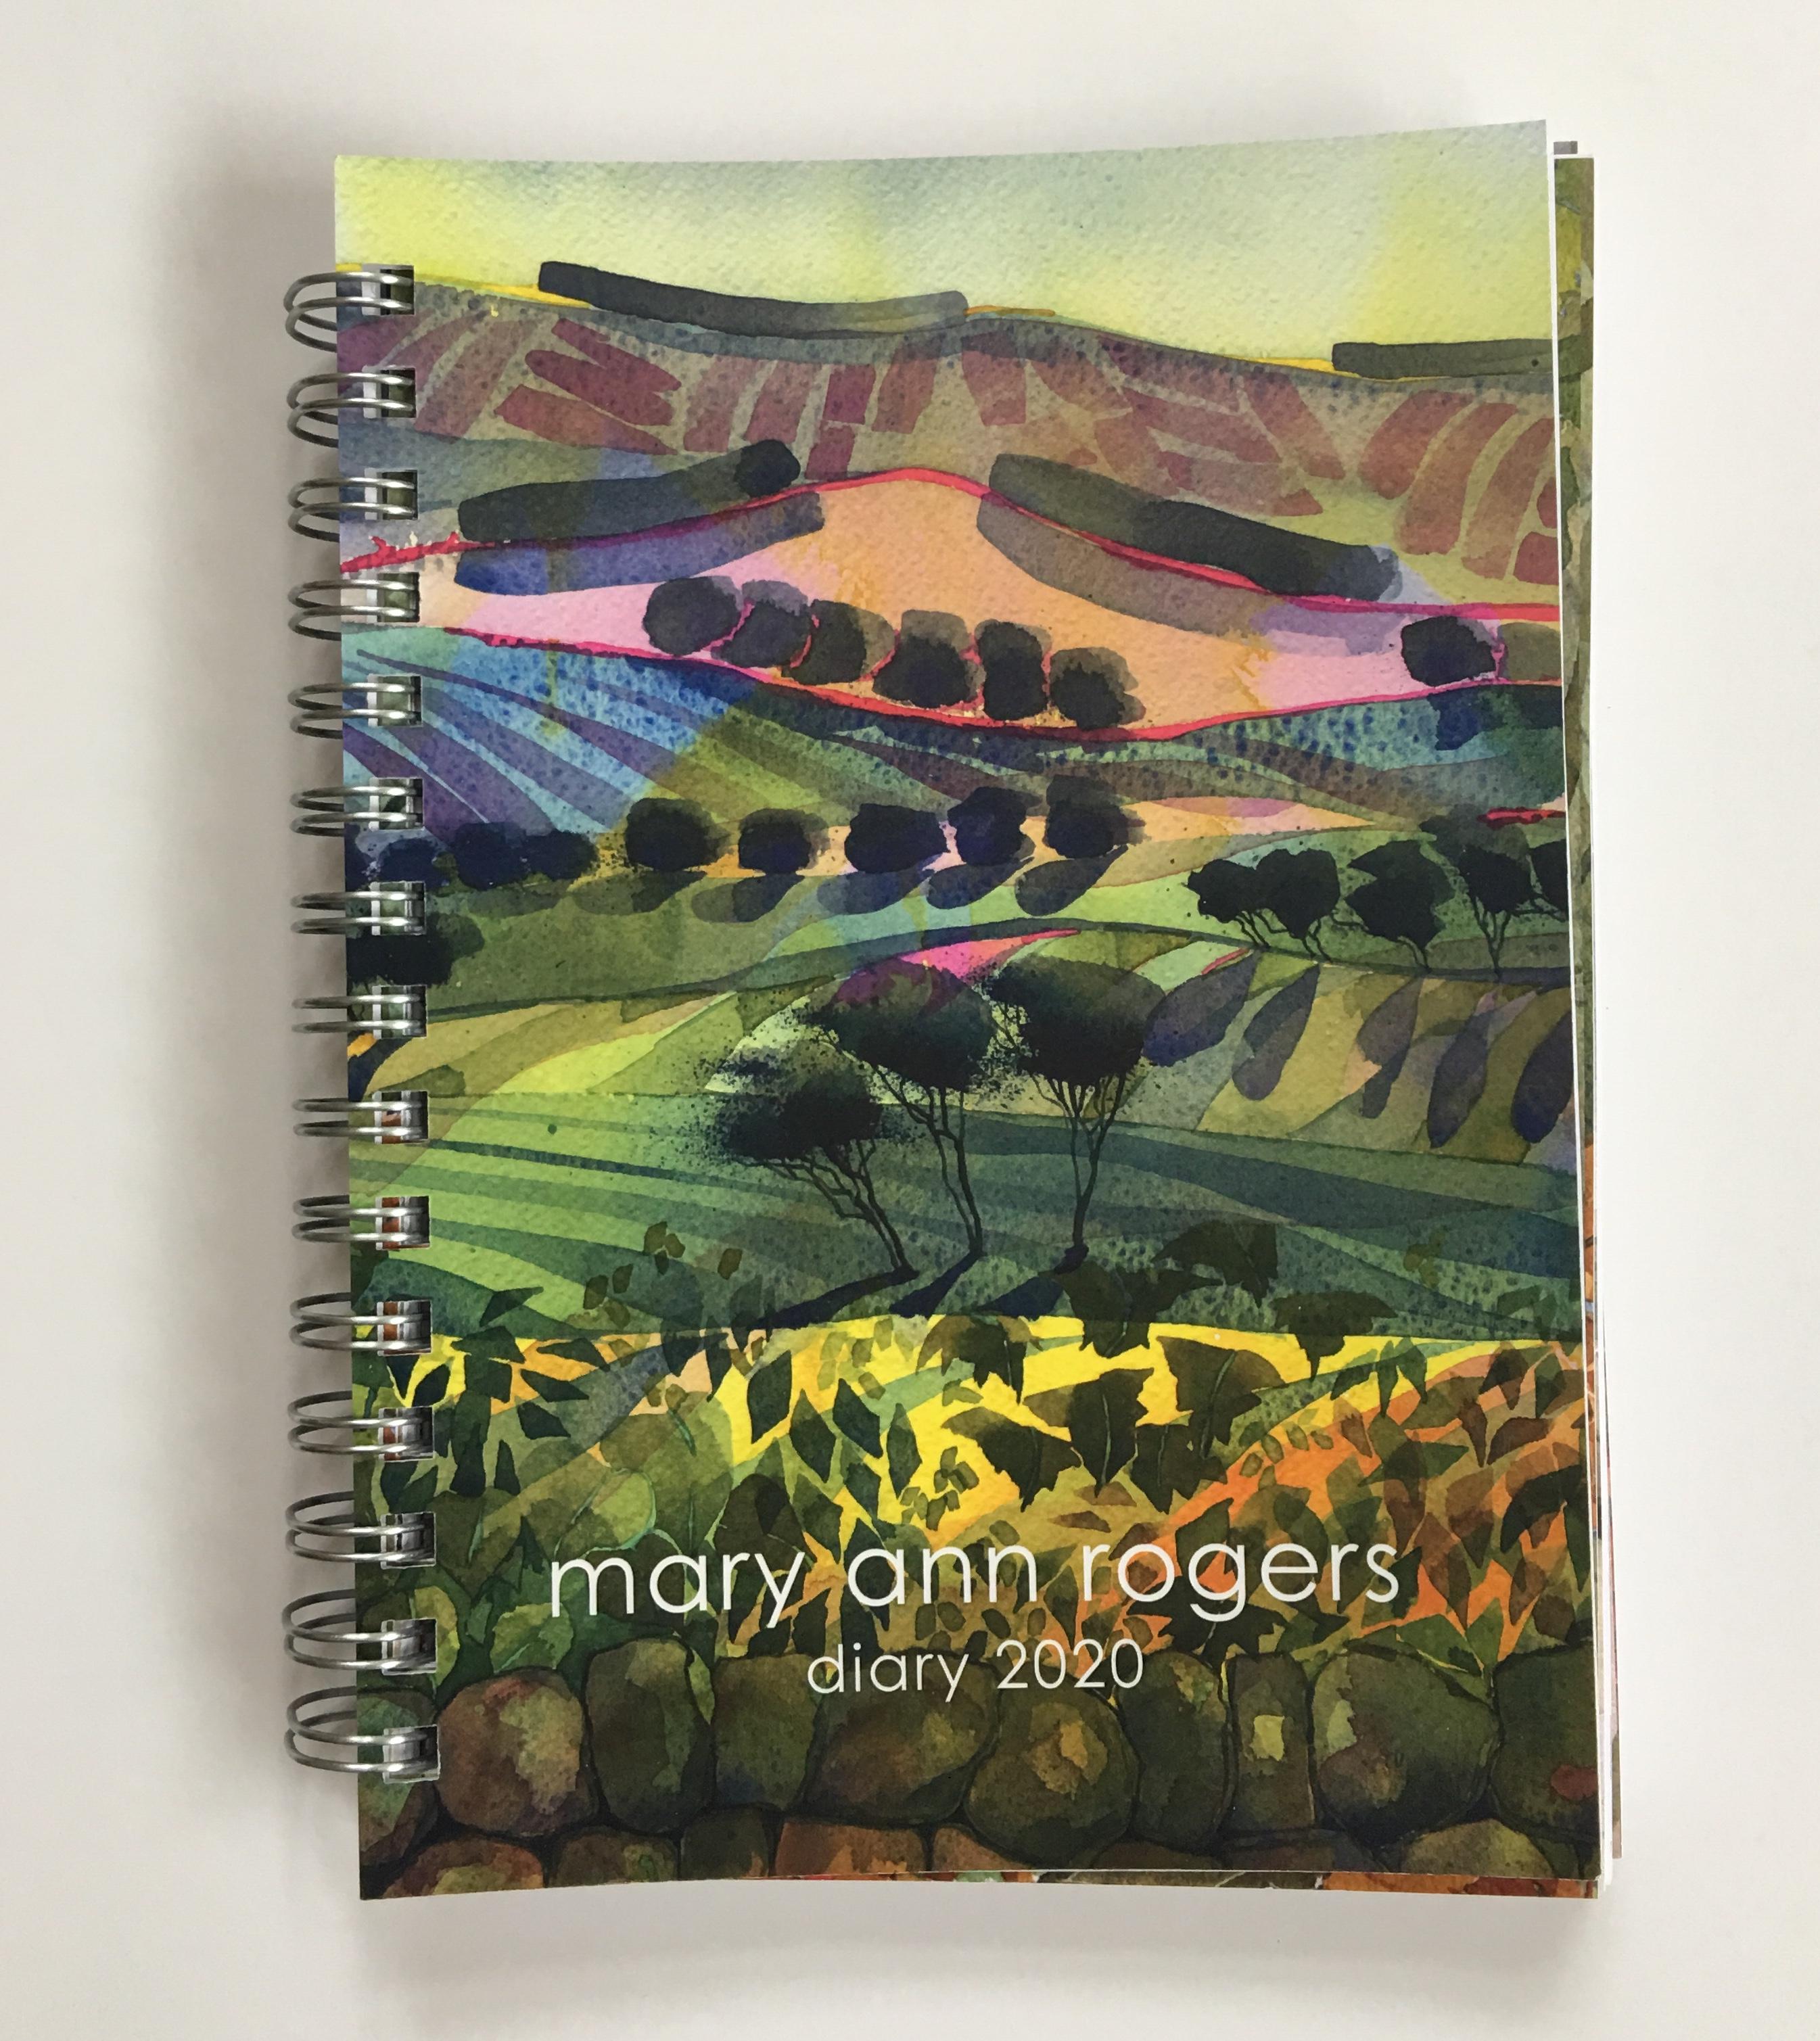 Diary 2020, Ridge & Furrow image